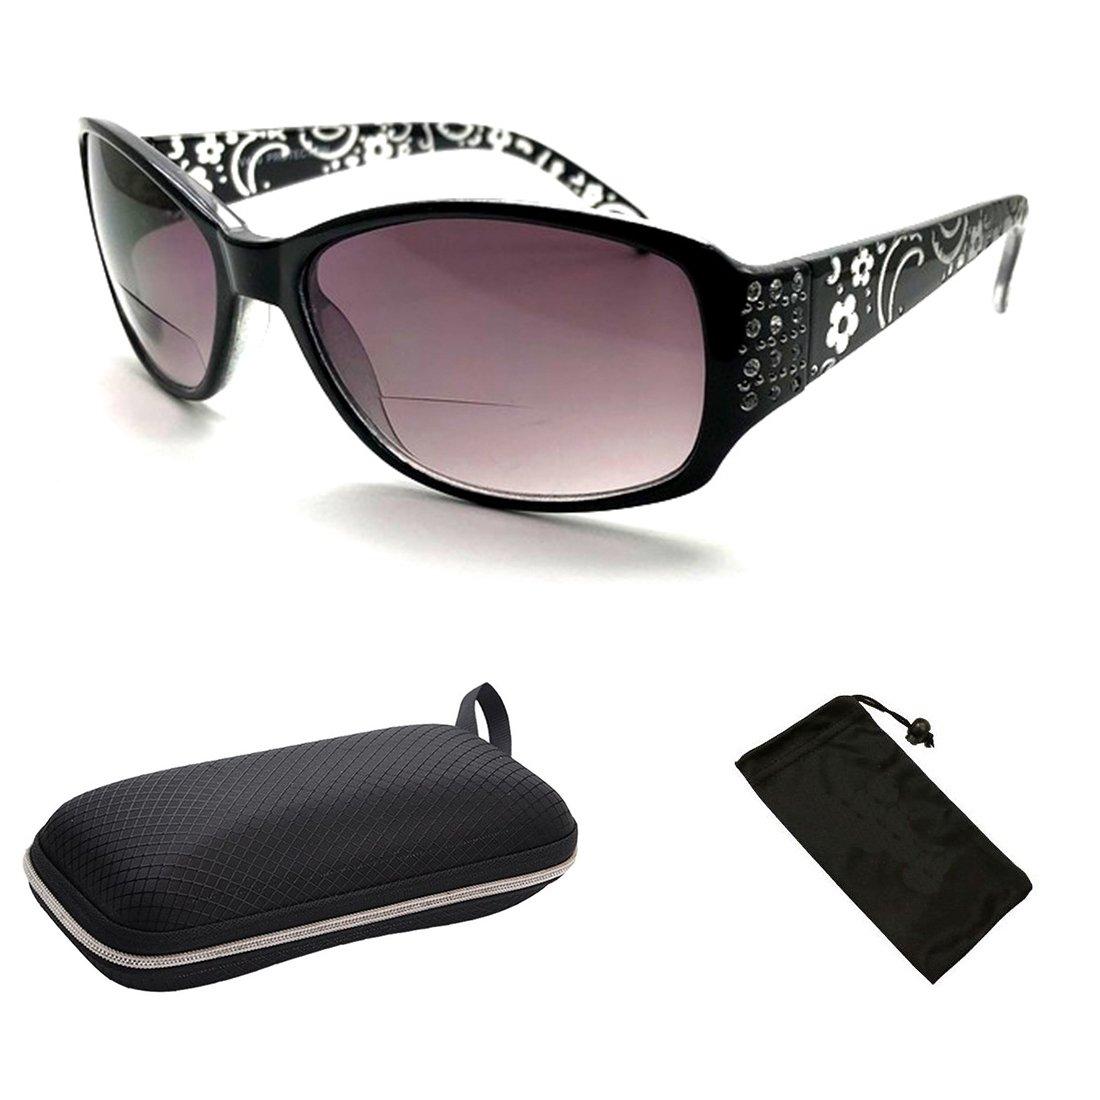 Fashion Designer Sun Readers Women Bifocal Sunglasses + Reading Glasses All in One … (Black, 2.50)